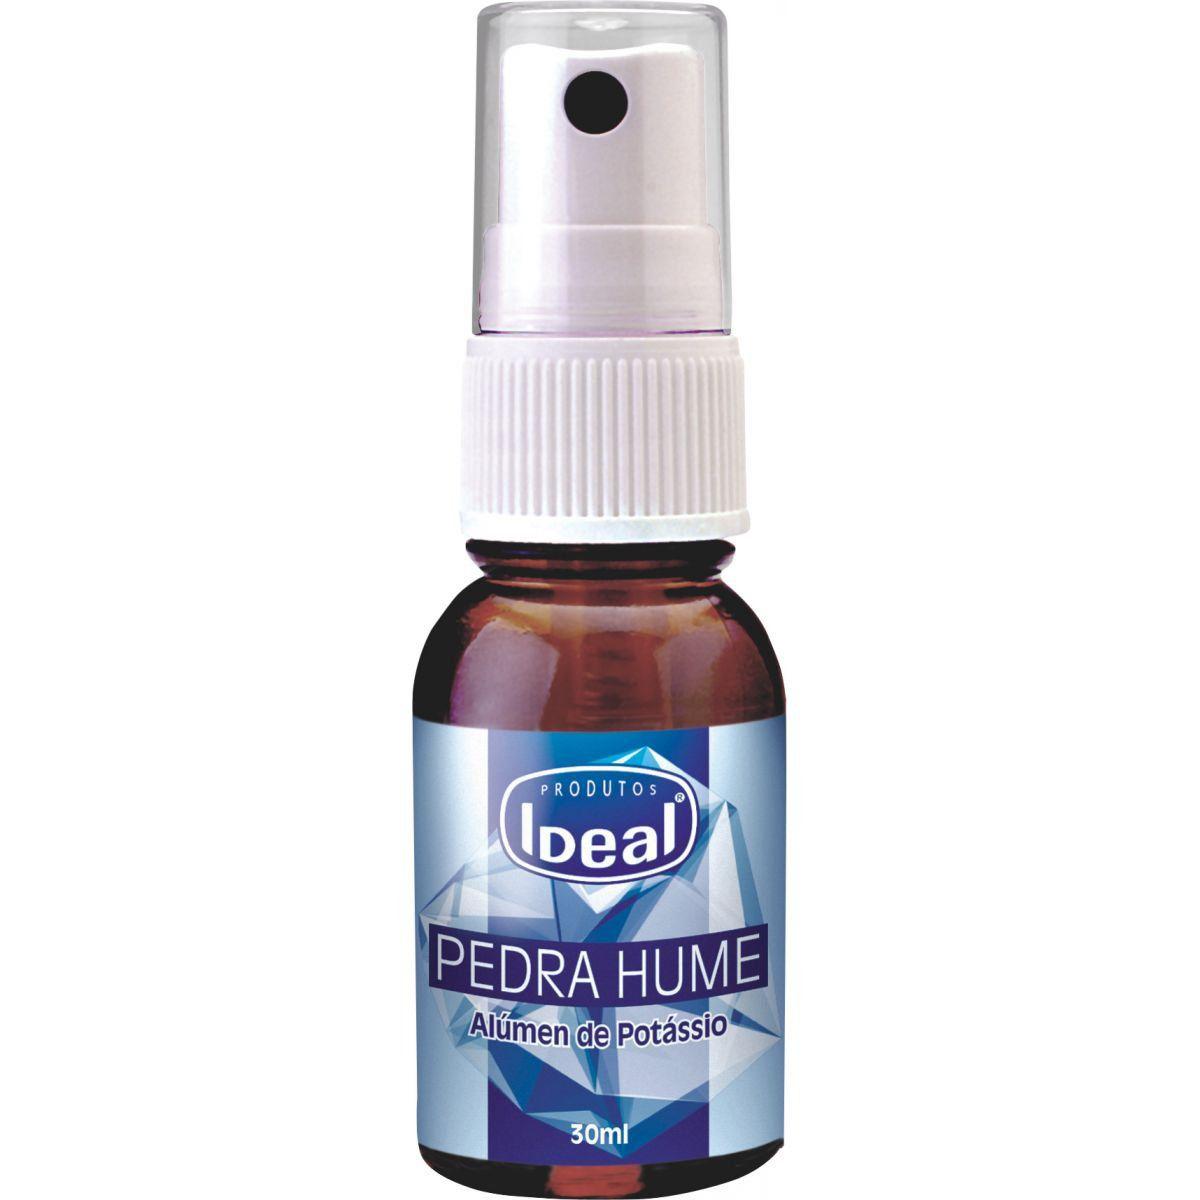 Pedra hume spray Ideal 30ml  - Sílvia Pedrarias & Cia